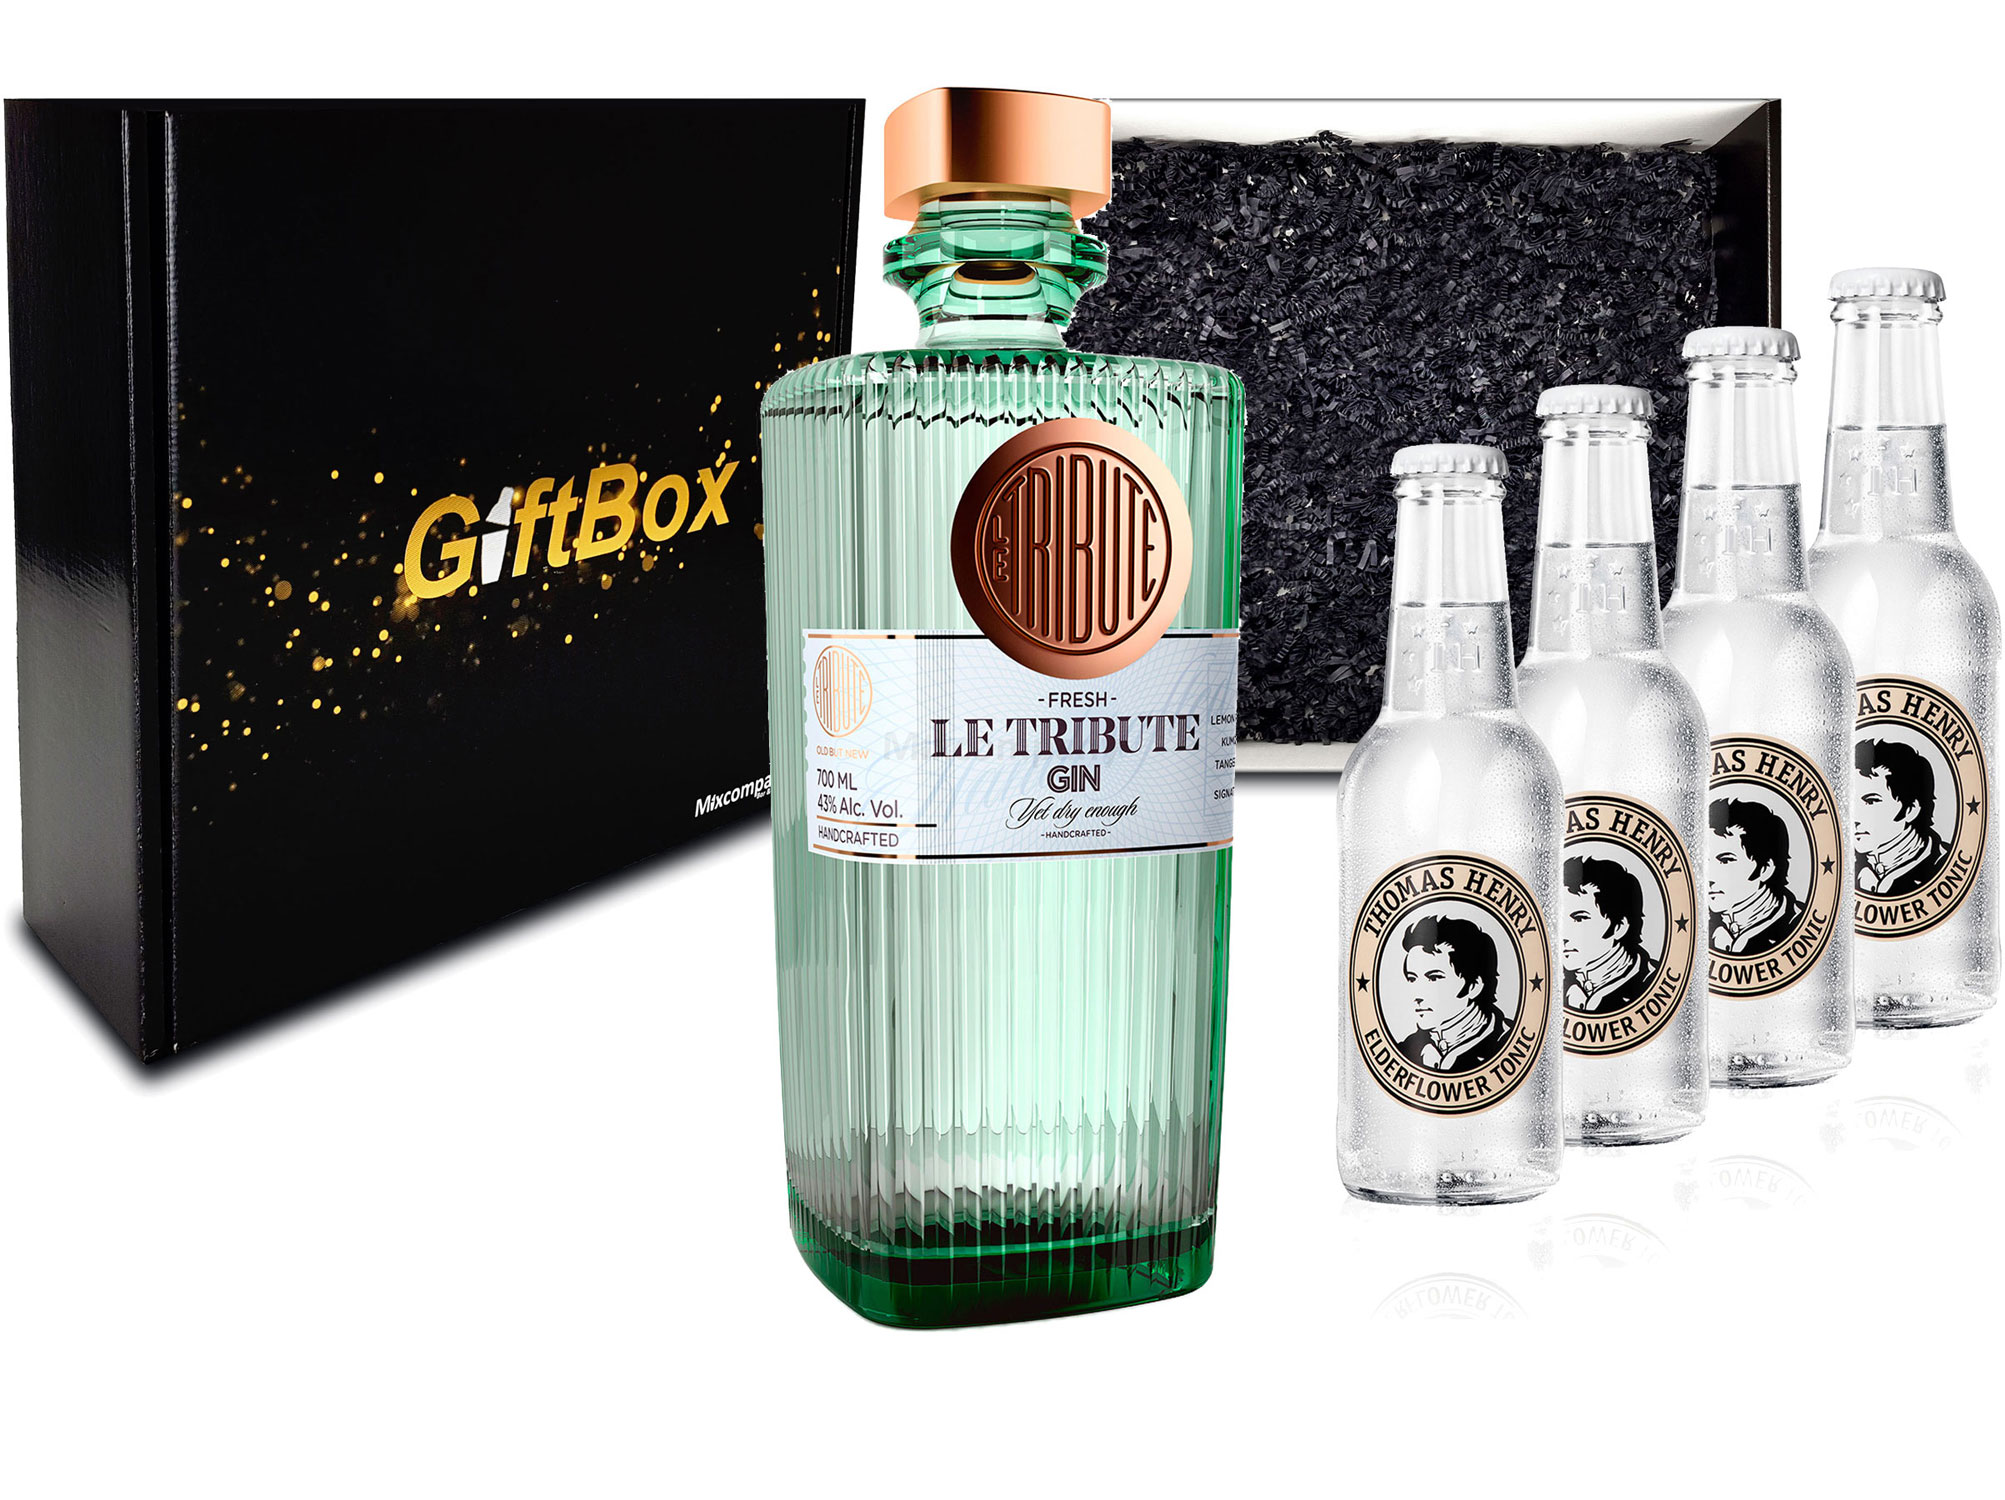 Gin Tonic Giftbox Geschenkset - Le Tribute Gin 0,7l (43% Vol) + 4x Thomas Henry Elderflower Water 200ml inkl. Pfand MEHRWEG - [Enthält Sulfite]